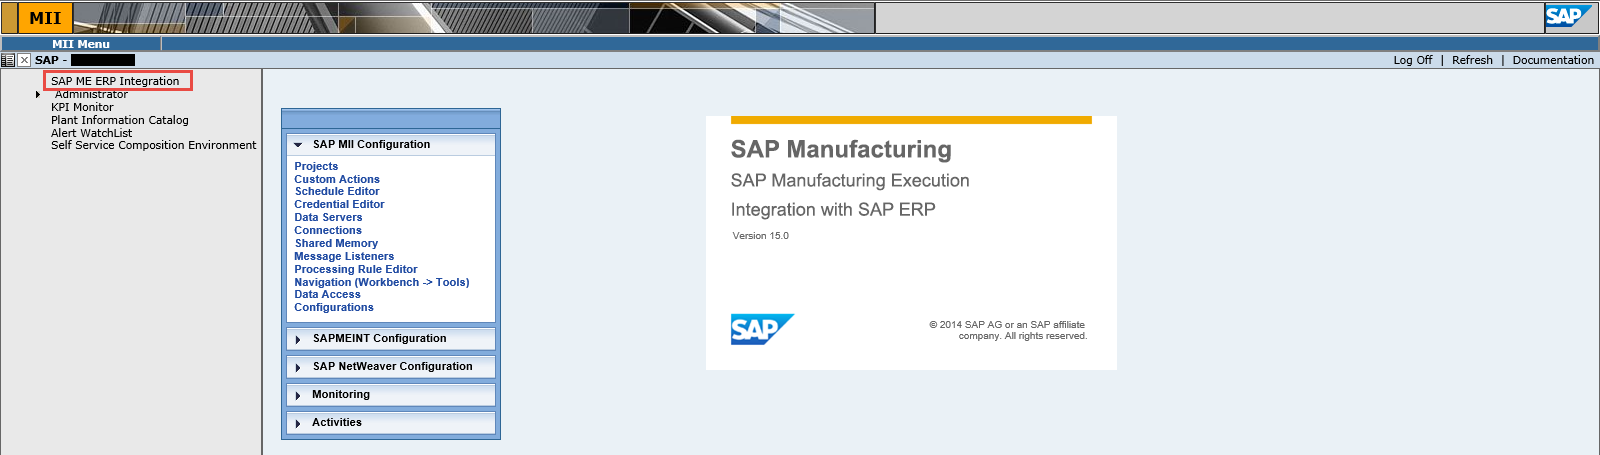 sap netweaver 7.4 process integration troubleshooting guide